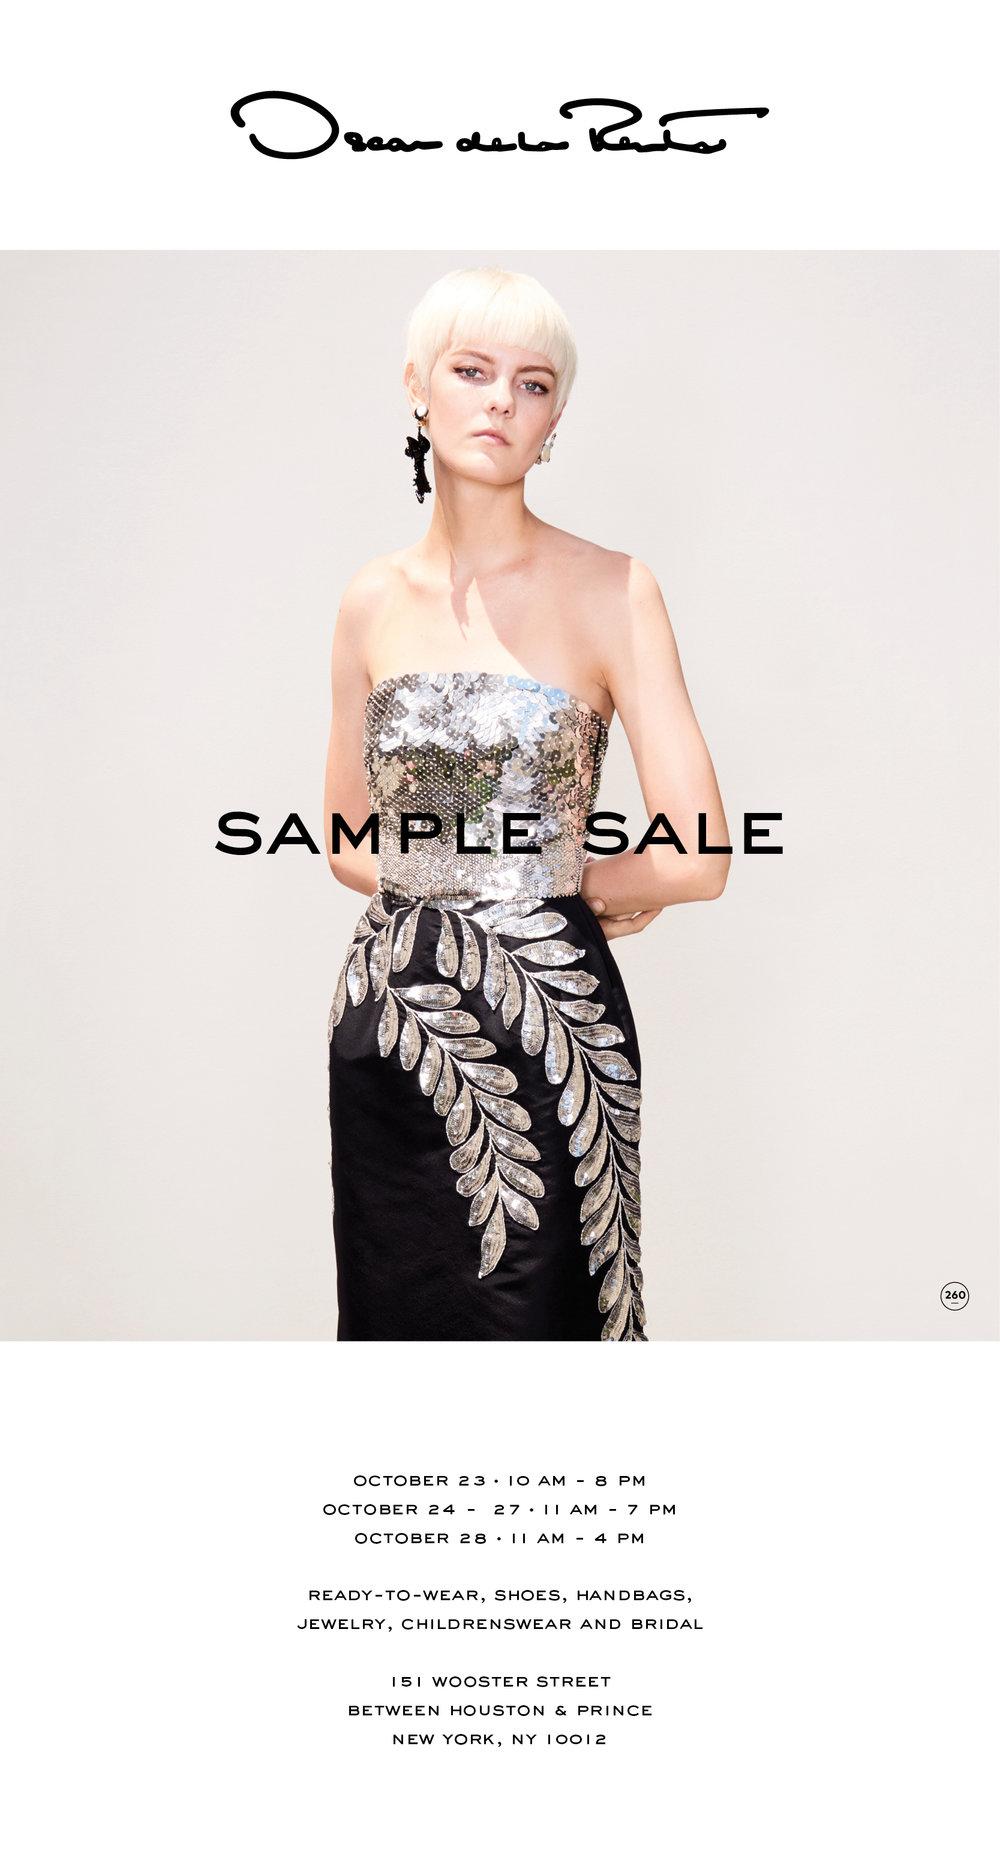 10.11_Sample Sale Evite_7LH3[7].jpg